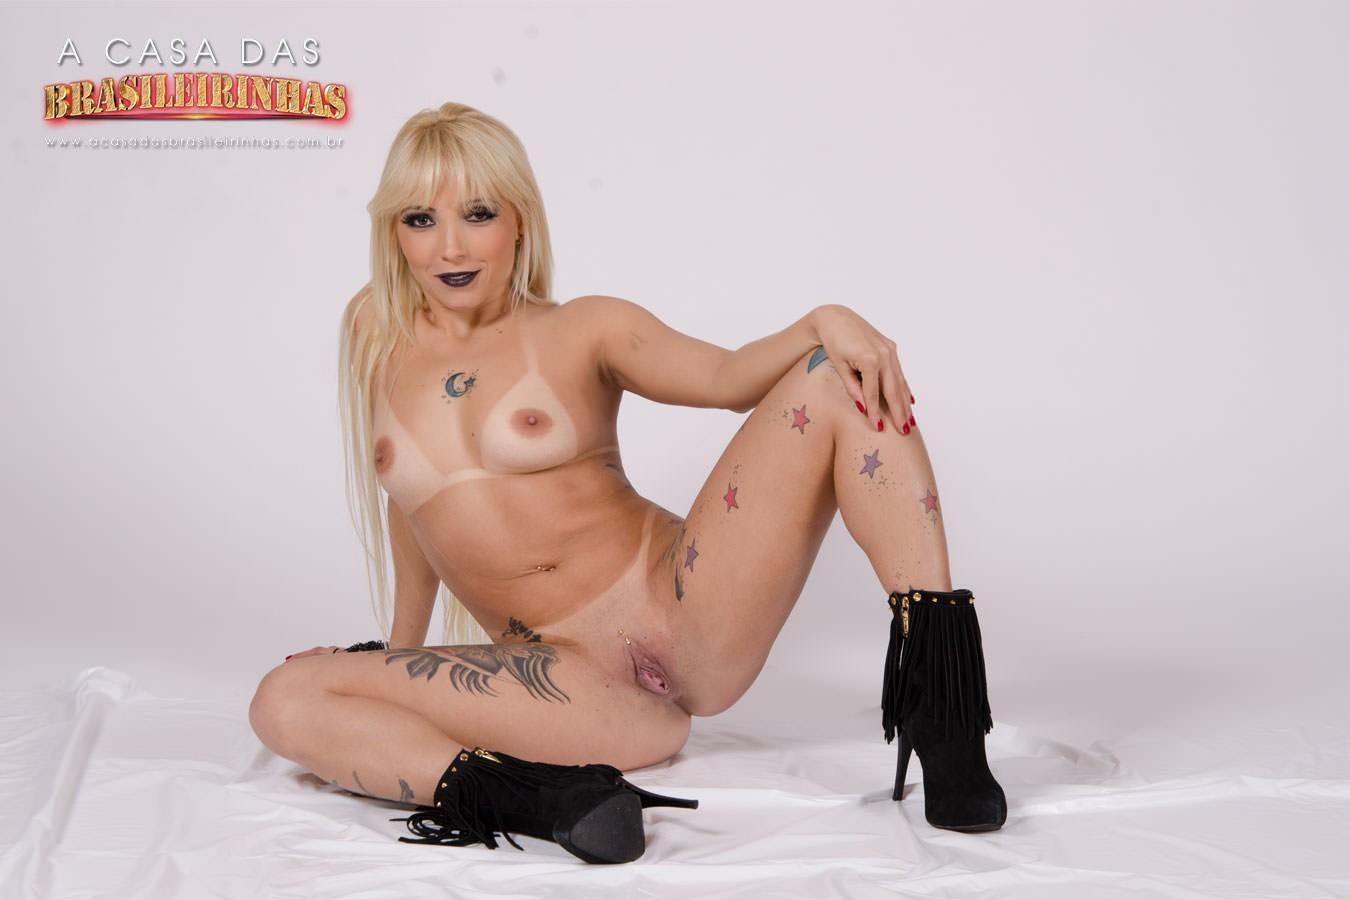 Penelope-Mendes-sentada-com-pernas-abertas.jpg